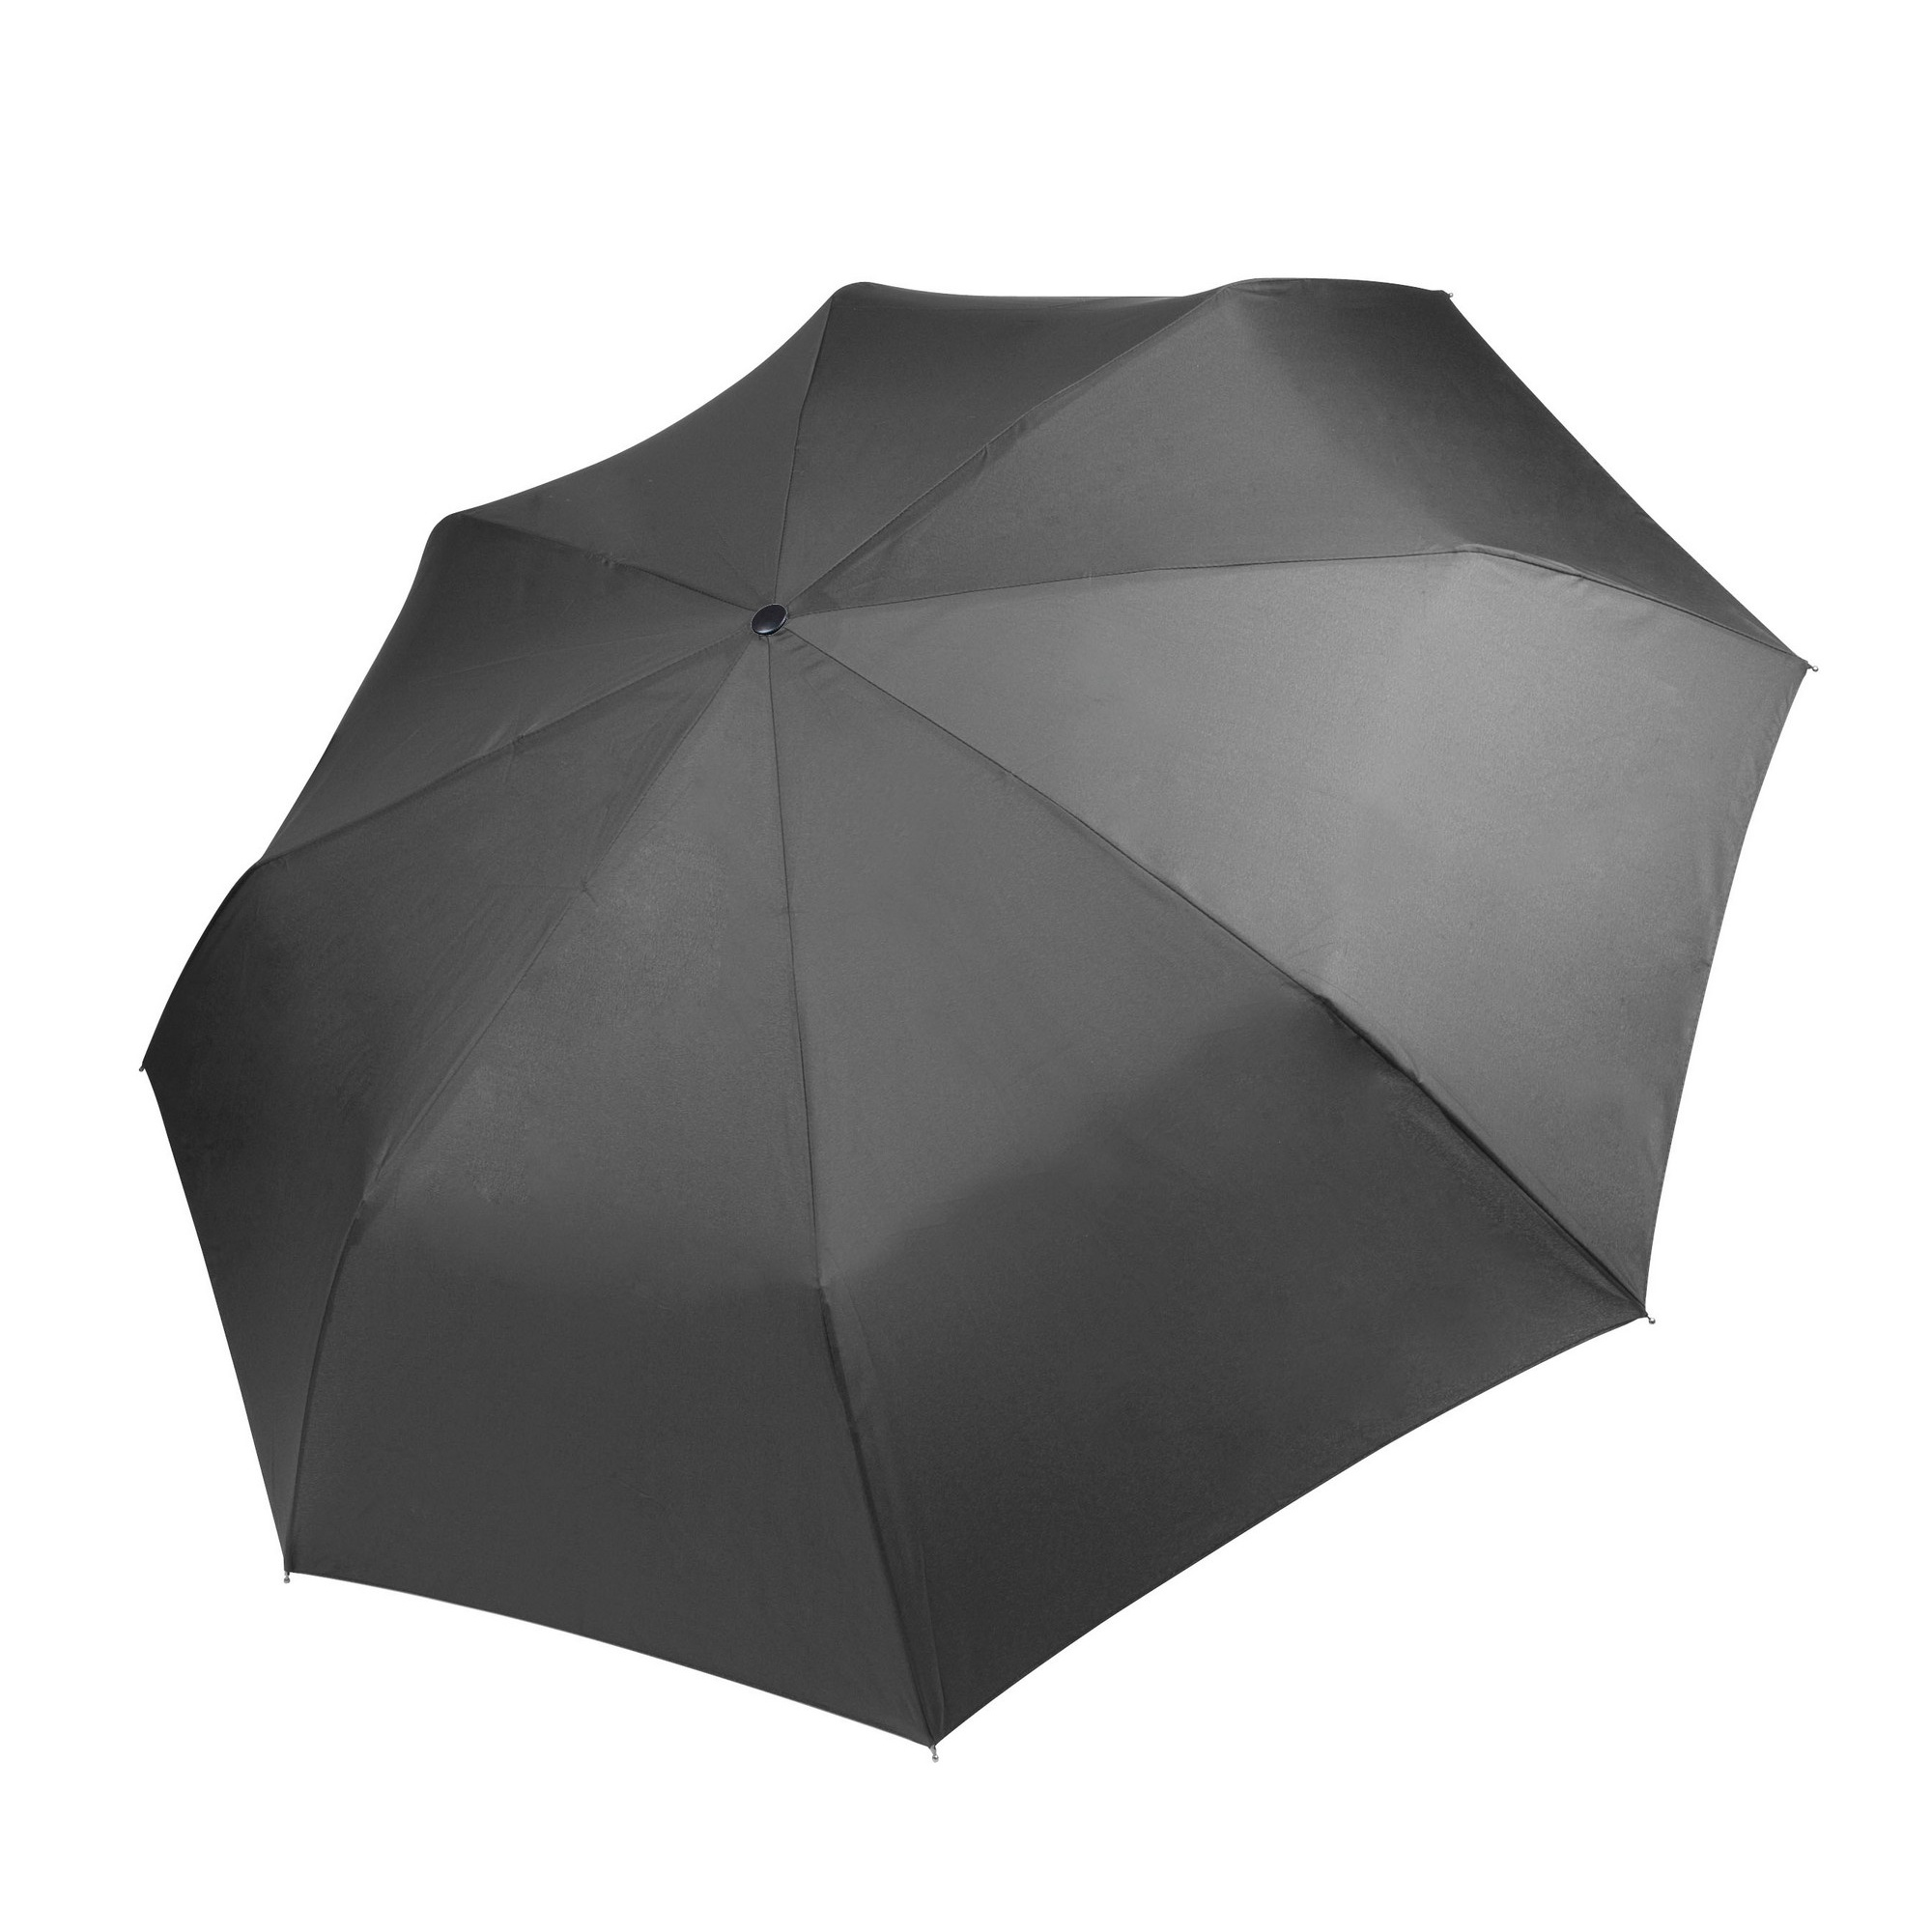 Kimood Foldable Handbag Umbrella (One Size) (Dark Grey)